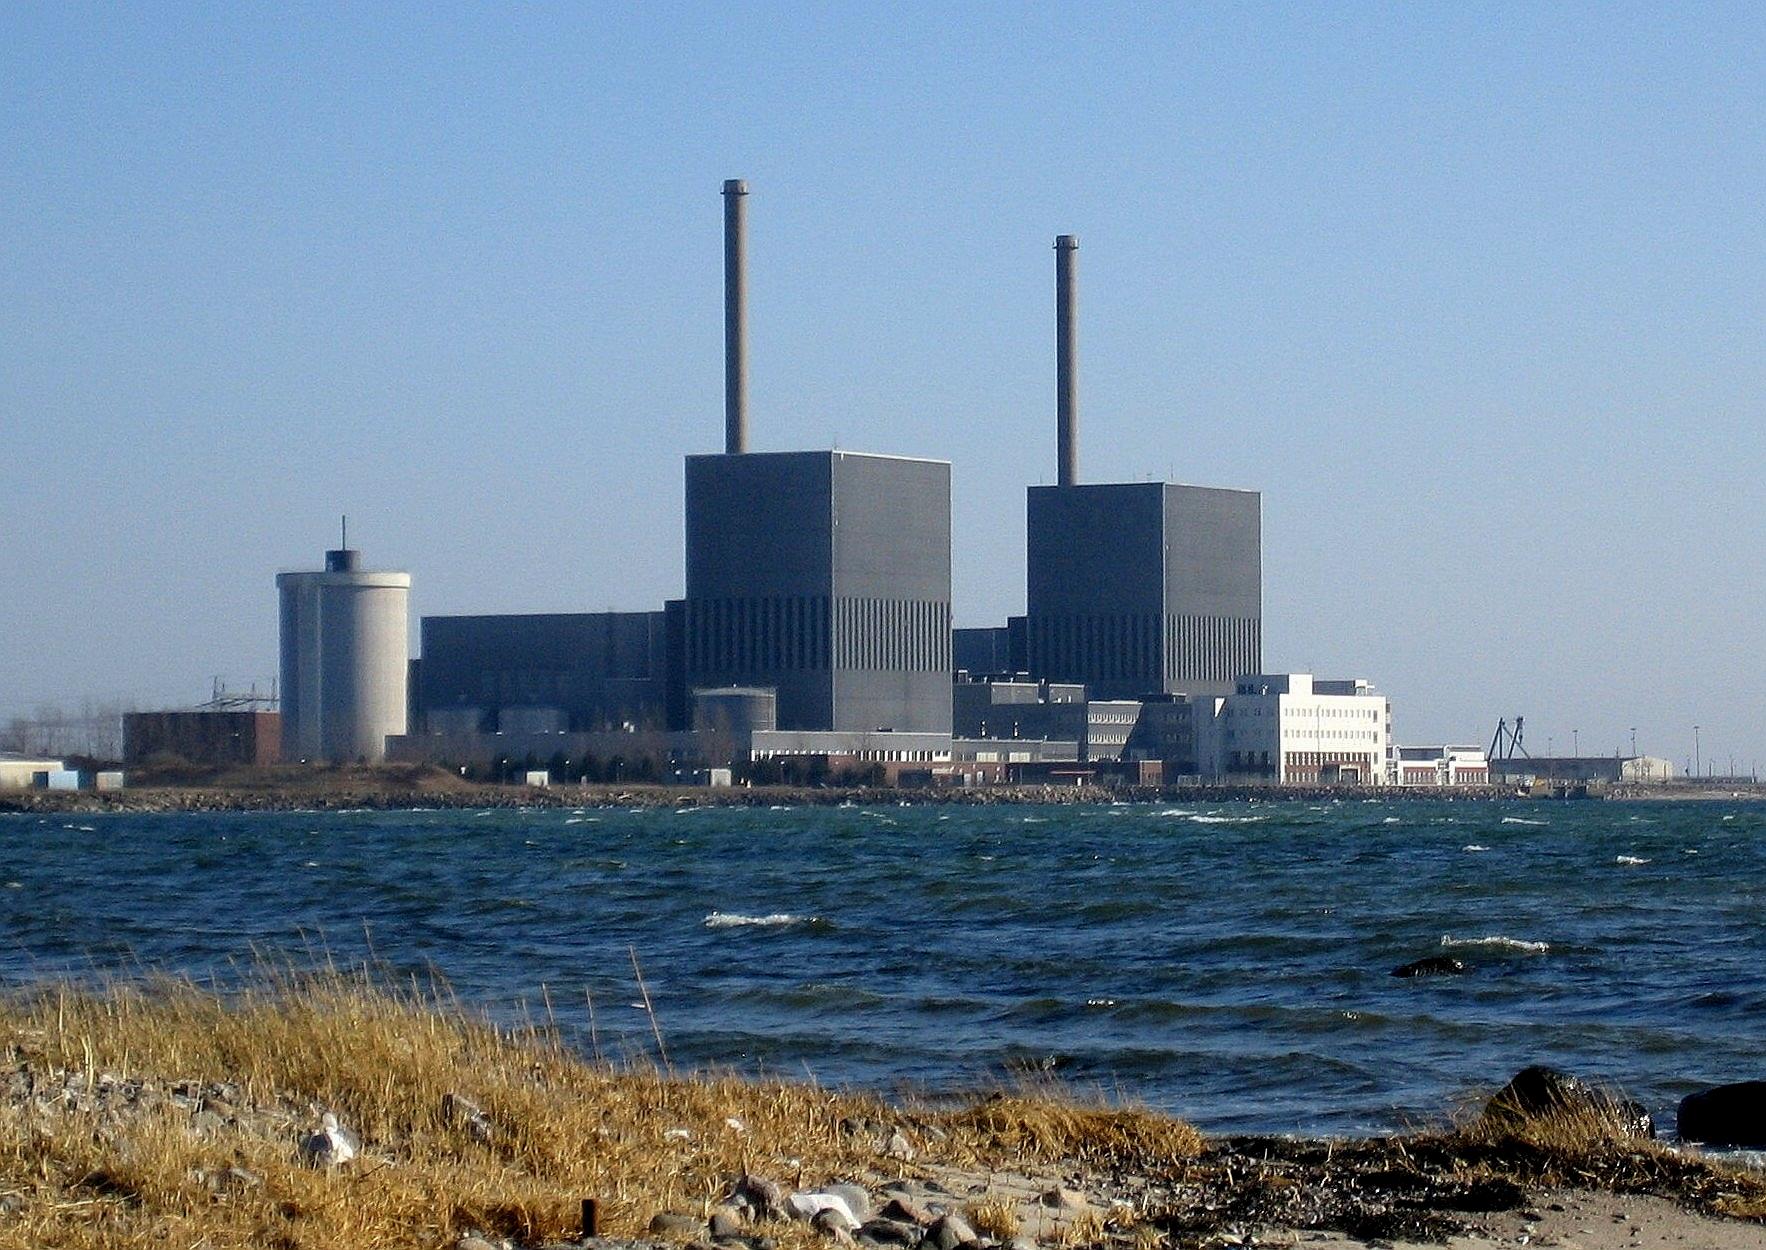 Barsebäck nuclear power plant in Skåne, Sweden